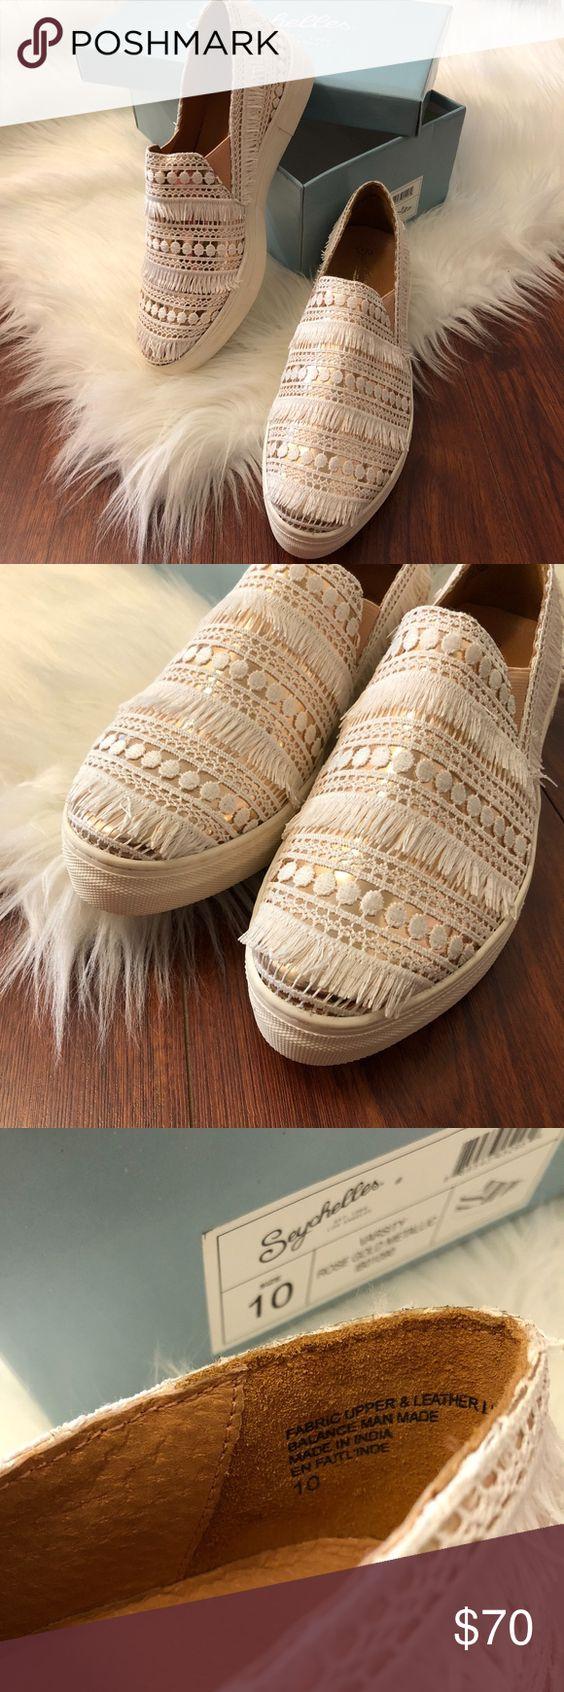 Affordable Boho Shoes